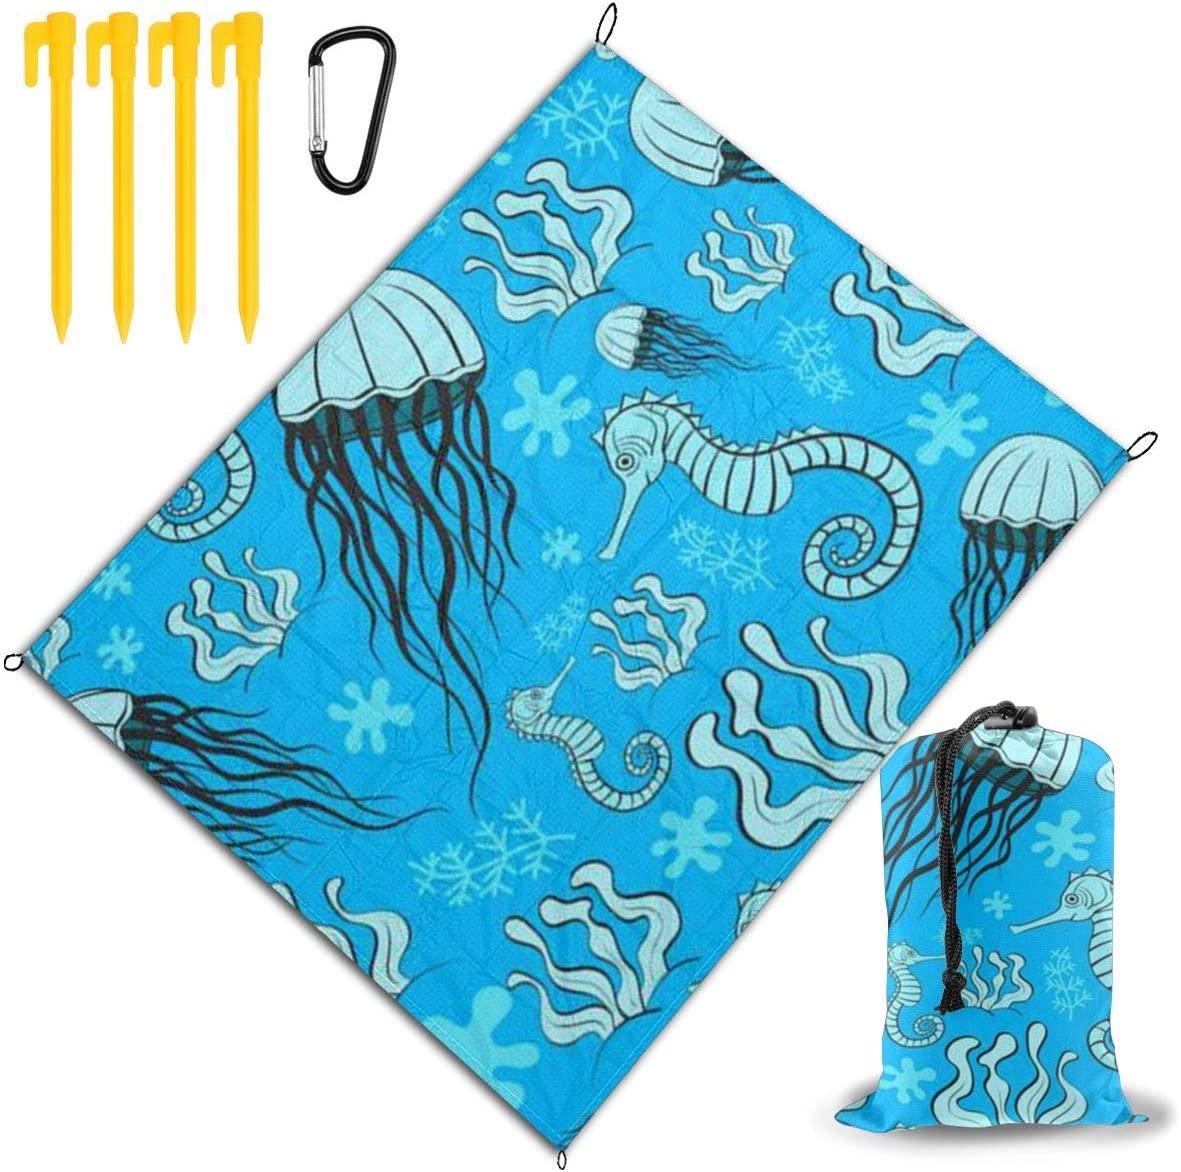 OESGAT Beach Blanket Waterproof,Jellyfish Sea Horse Printing Travel Outdoor Picnic Mat Durable Sand Beach Mat,67